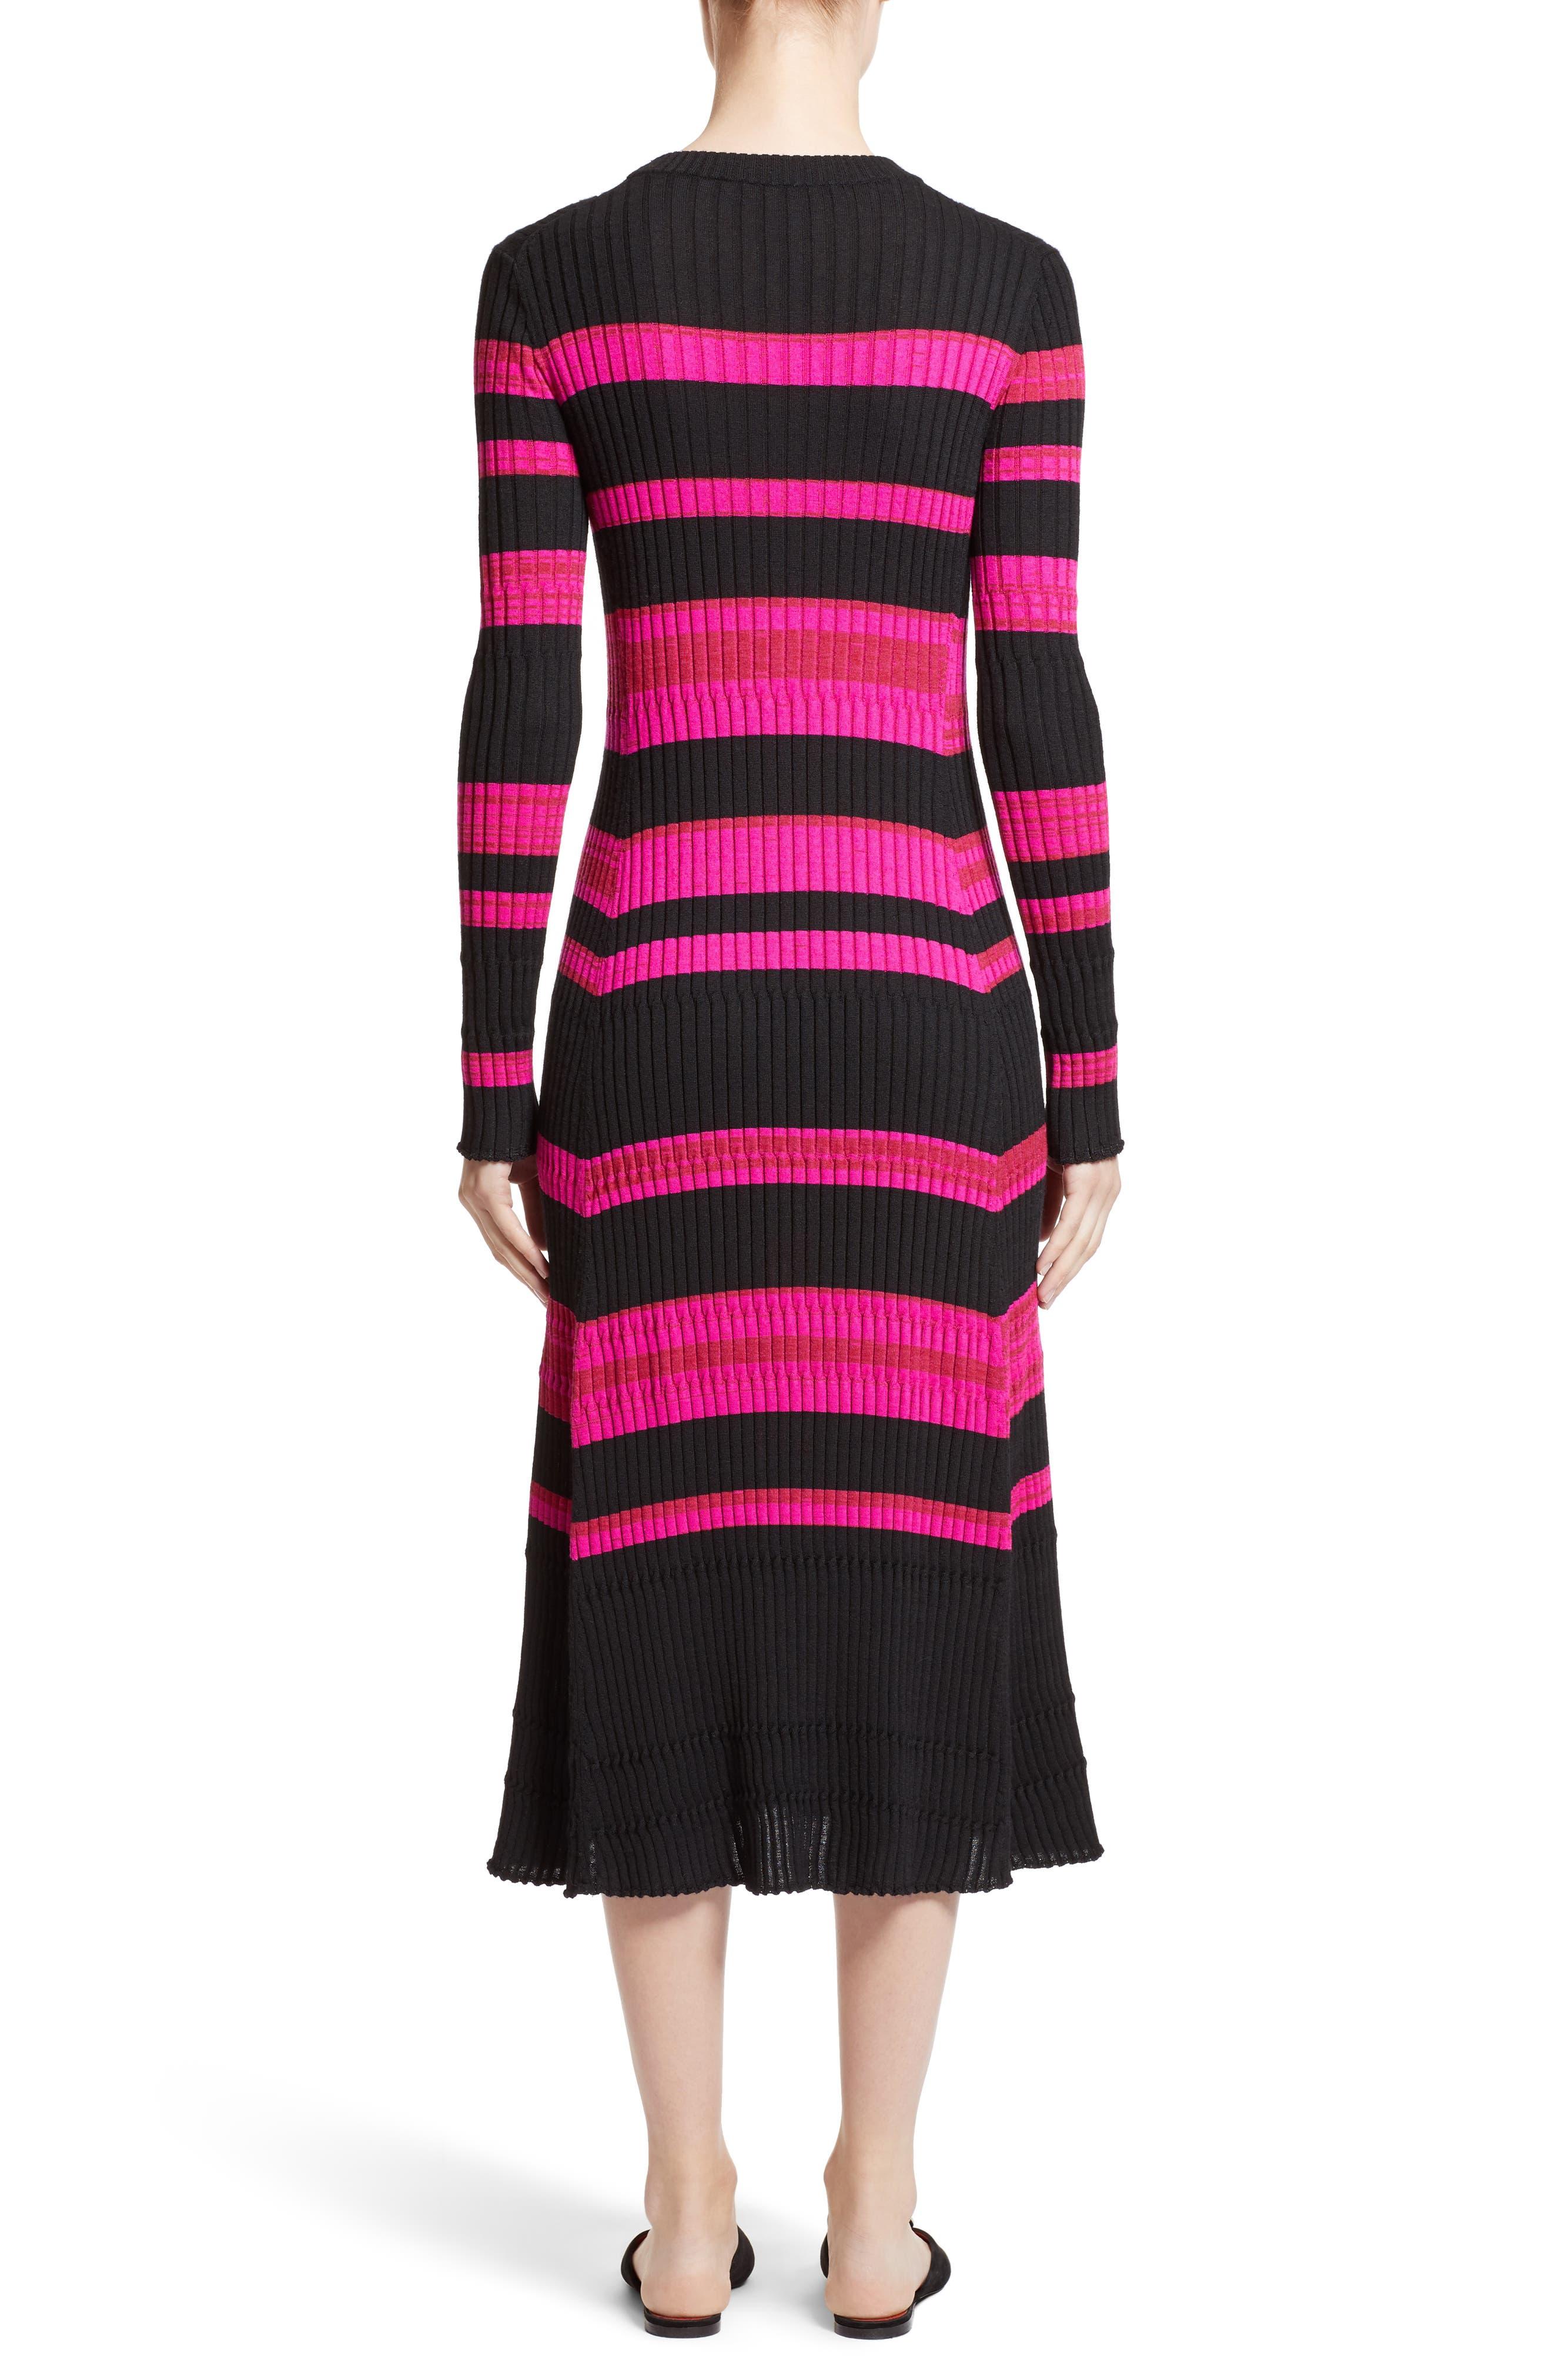 Stripe Cashmere, Wool & Silk Midi Dress,                             Alternate thumbnail 2, color,                             Black/ Electric Pink Multi